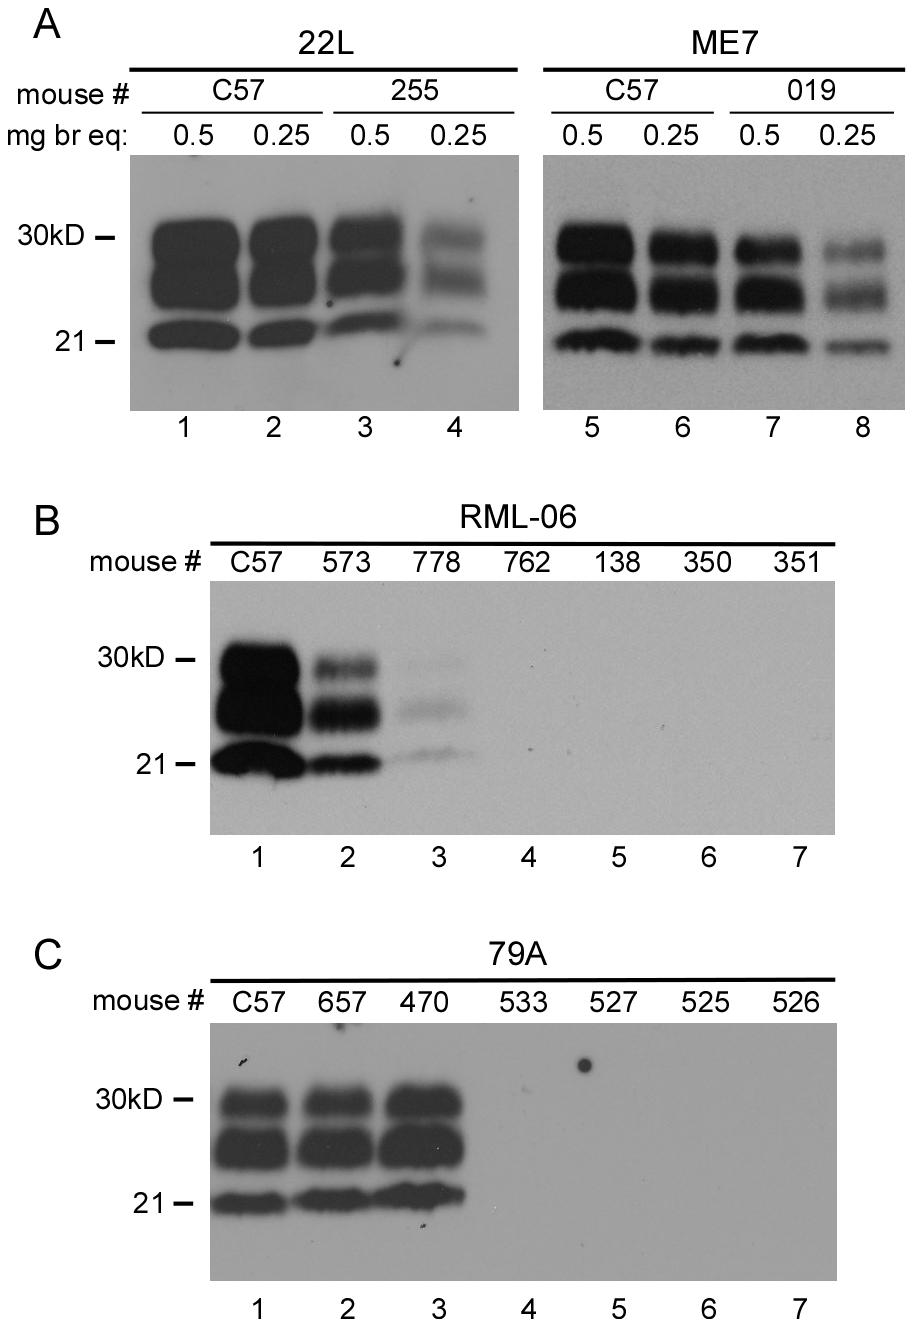 Immunoblot analysis of PrPres in scrapie-infected mice.